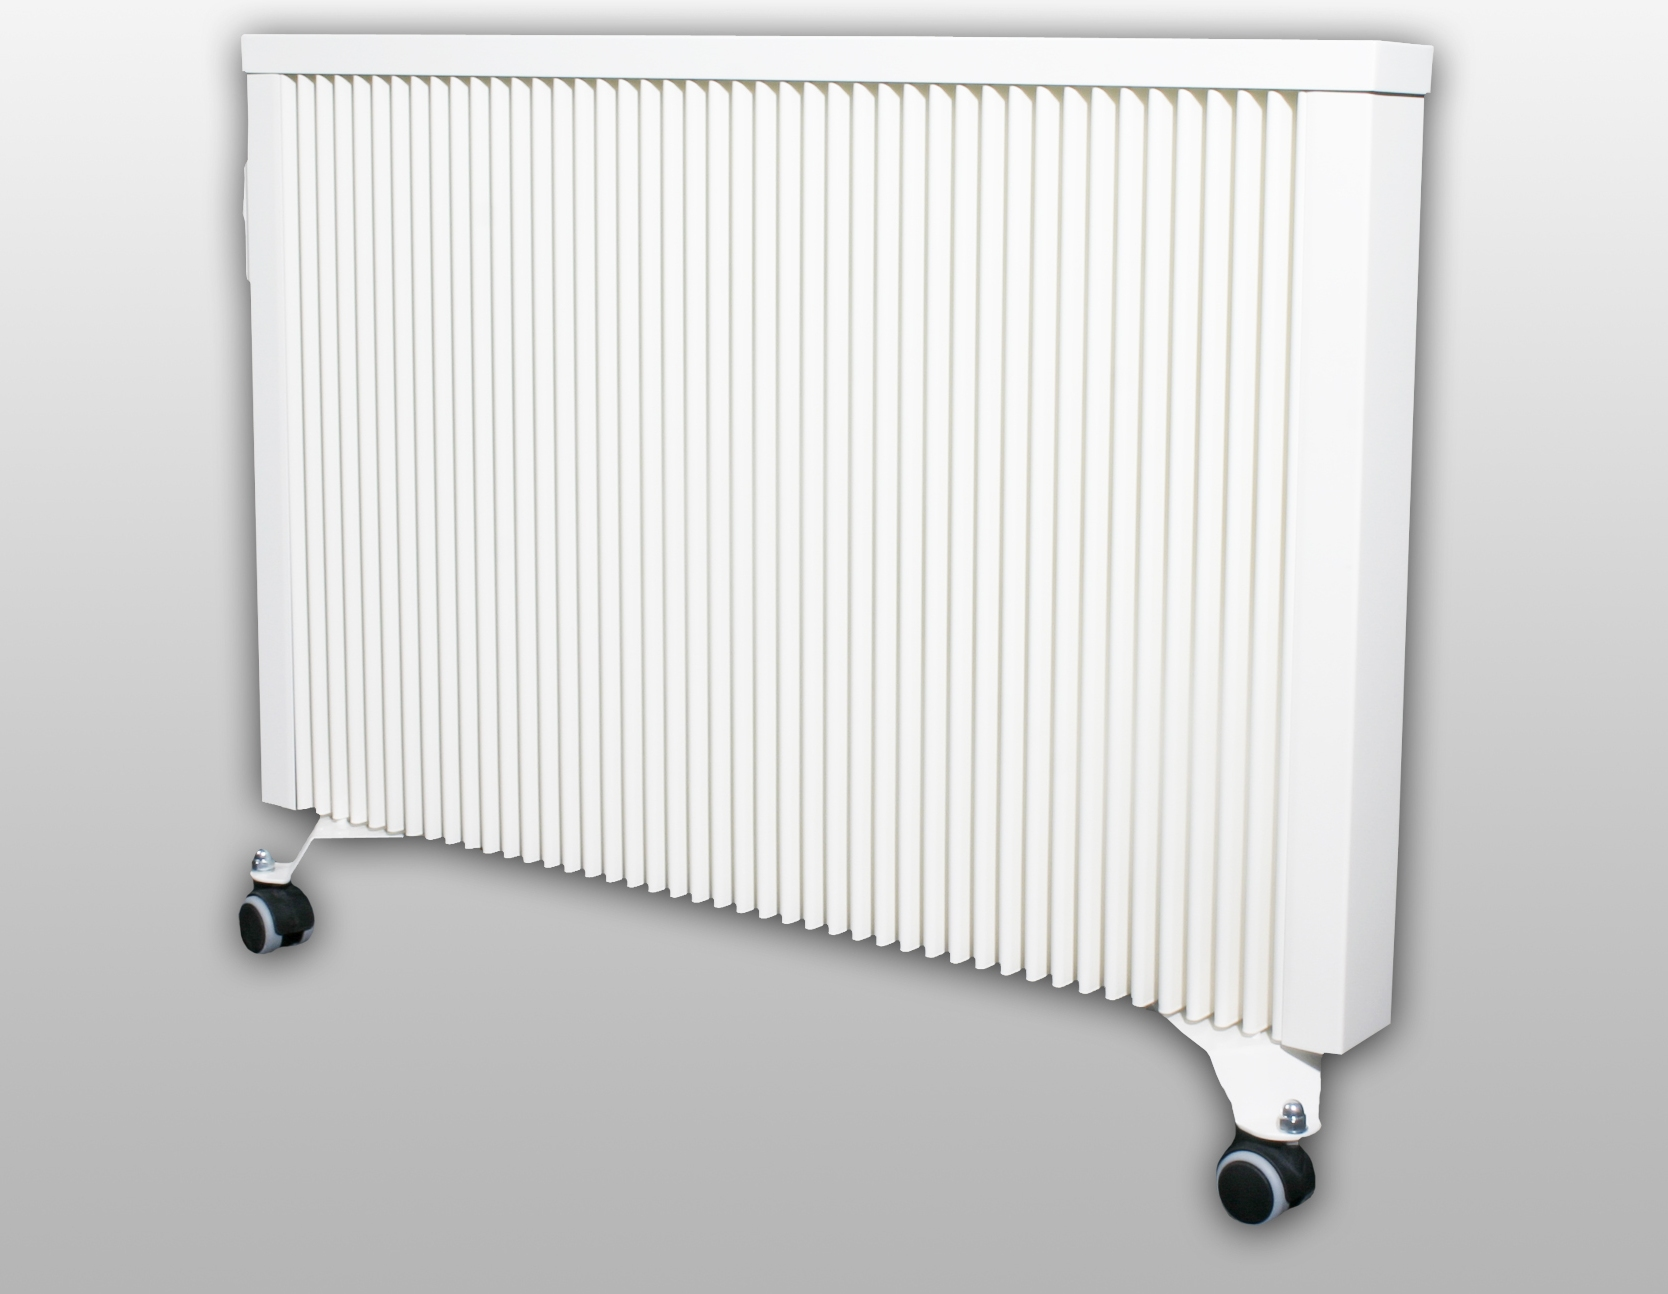 Dvojitý topný panel HD, TYP HD 125, 1250 W